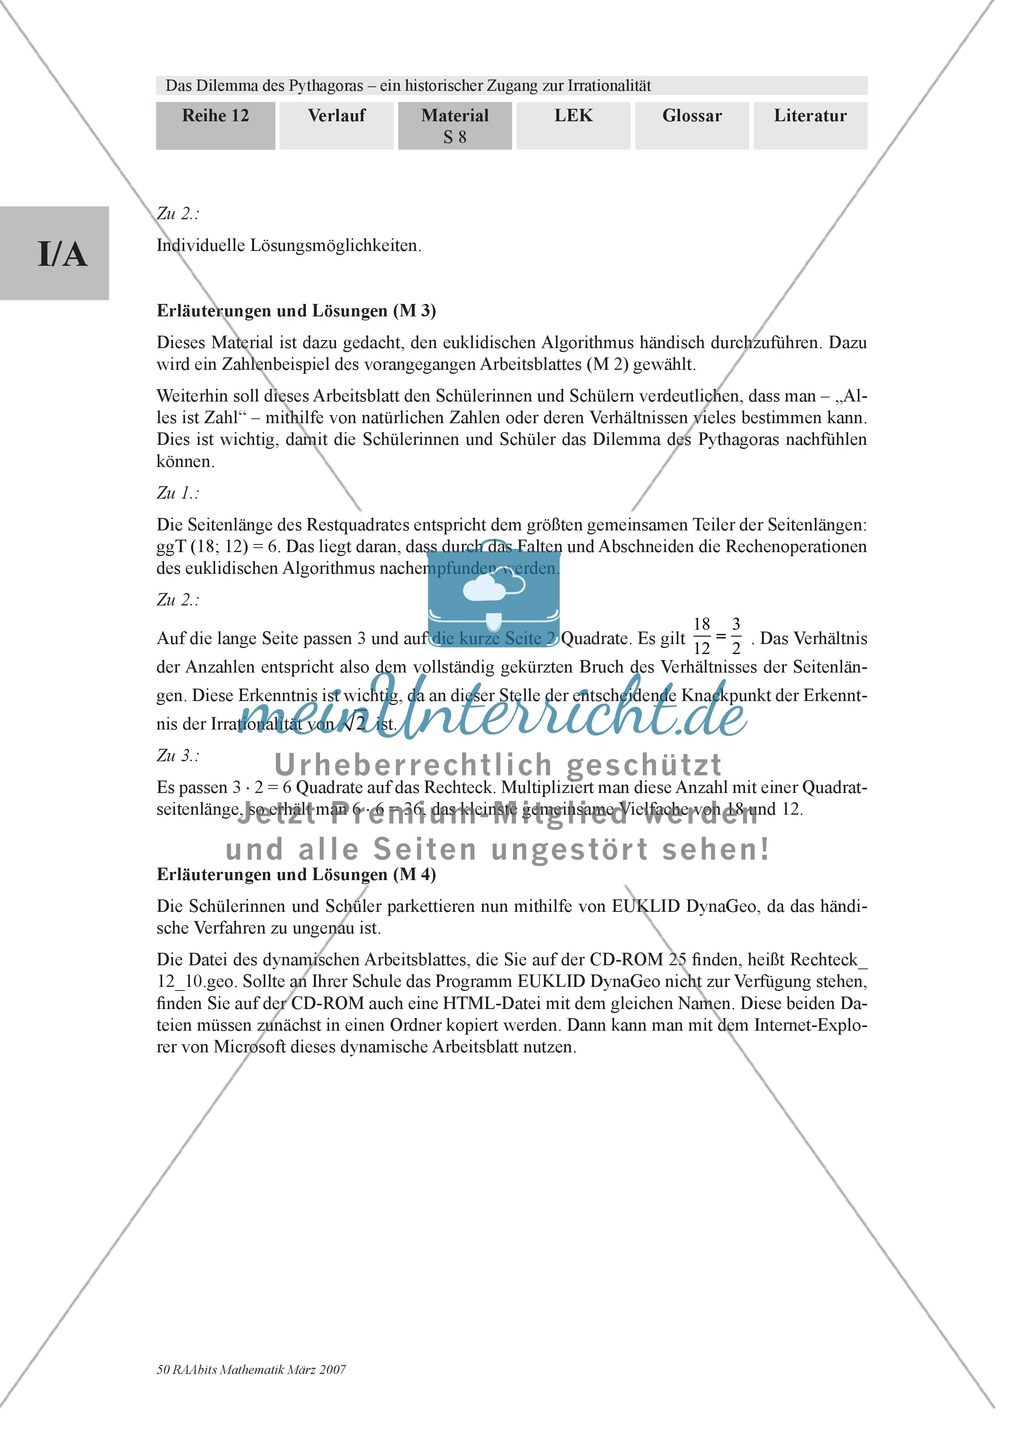 Fein Algorithmus Arbeitsblatt Bilder - Arbeitsblatt Schule ...